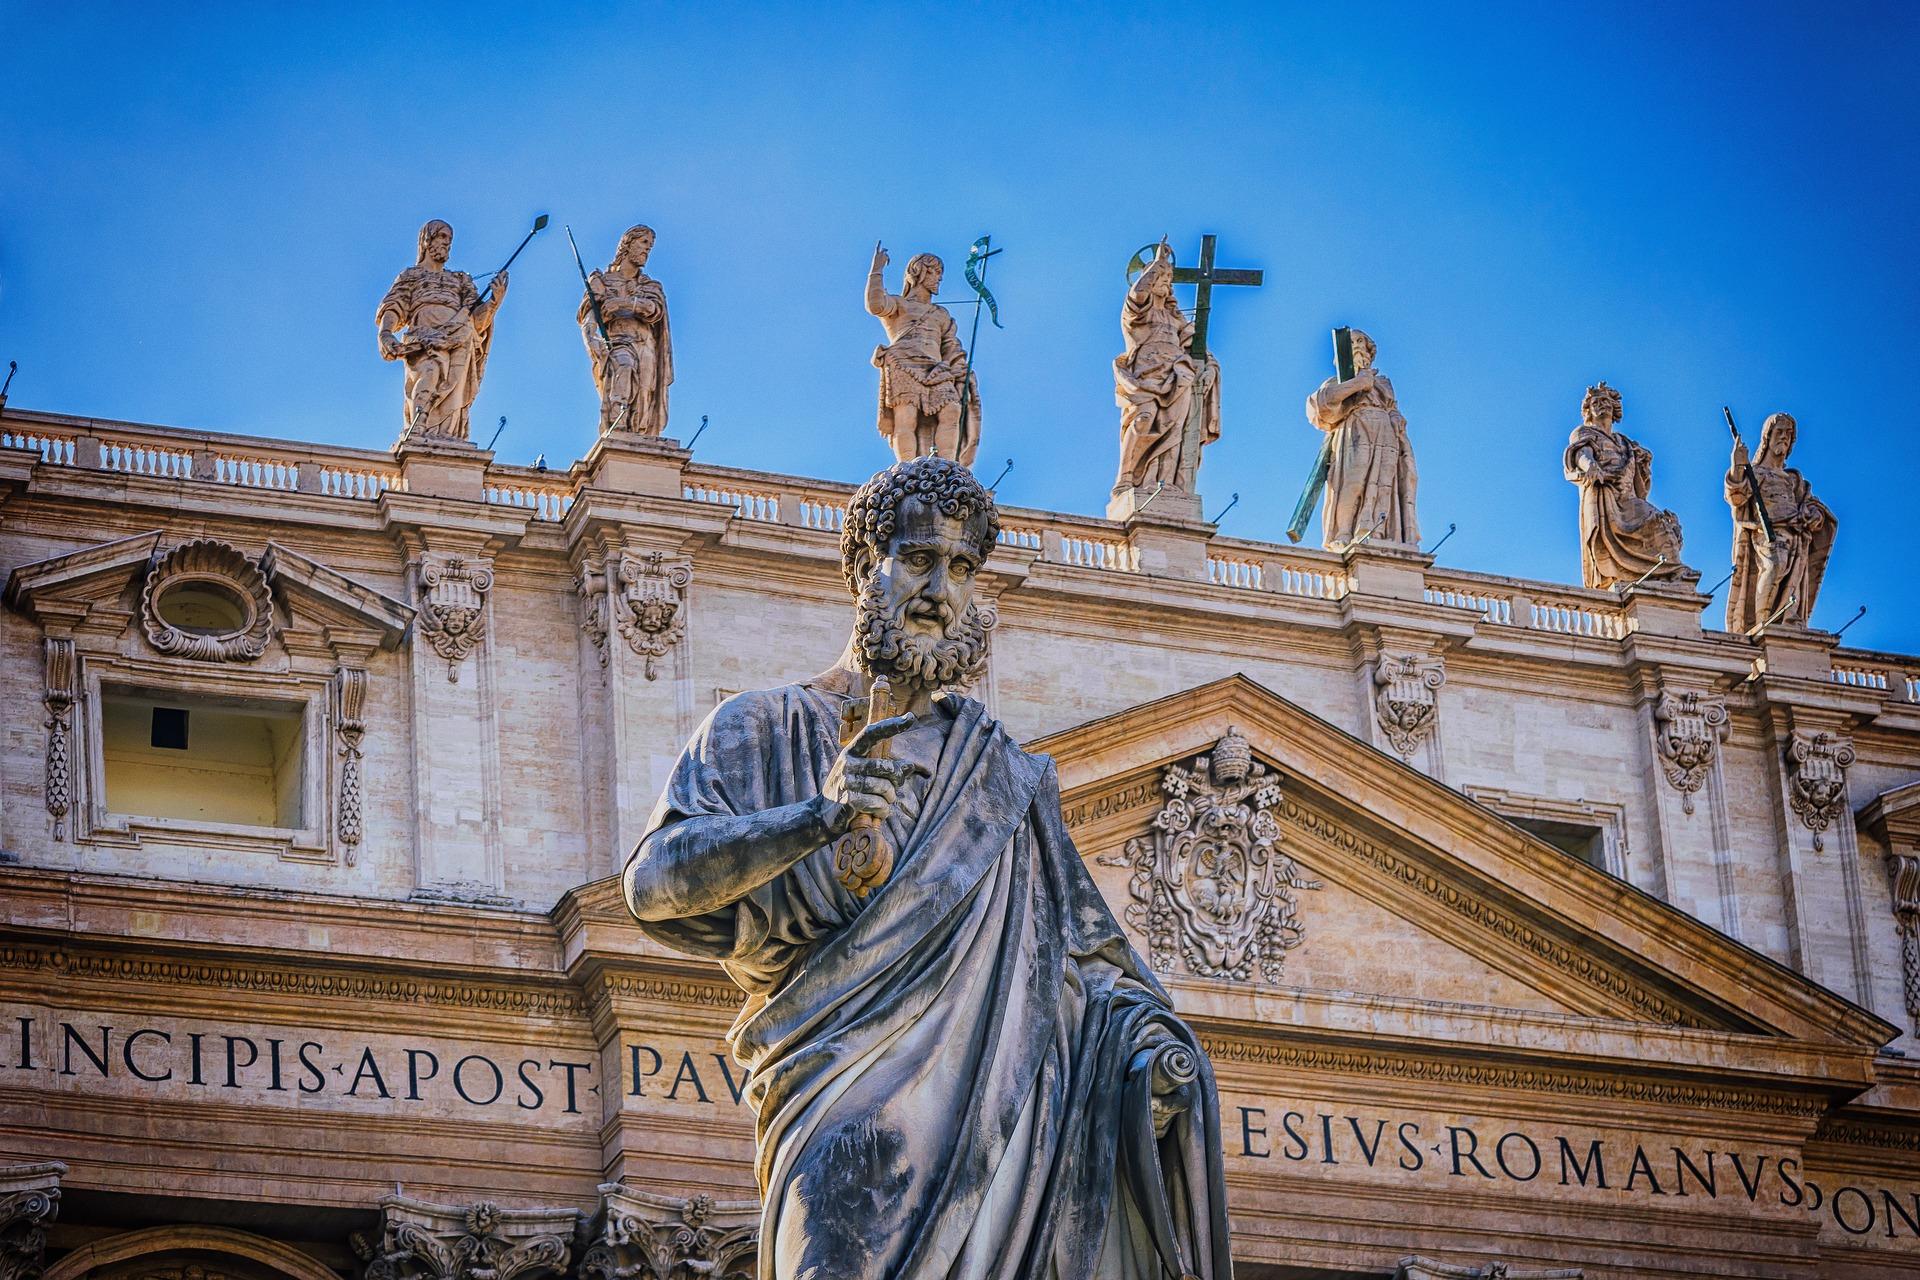 st peters basicillica, vatican